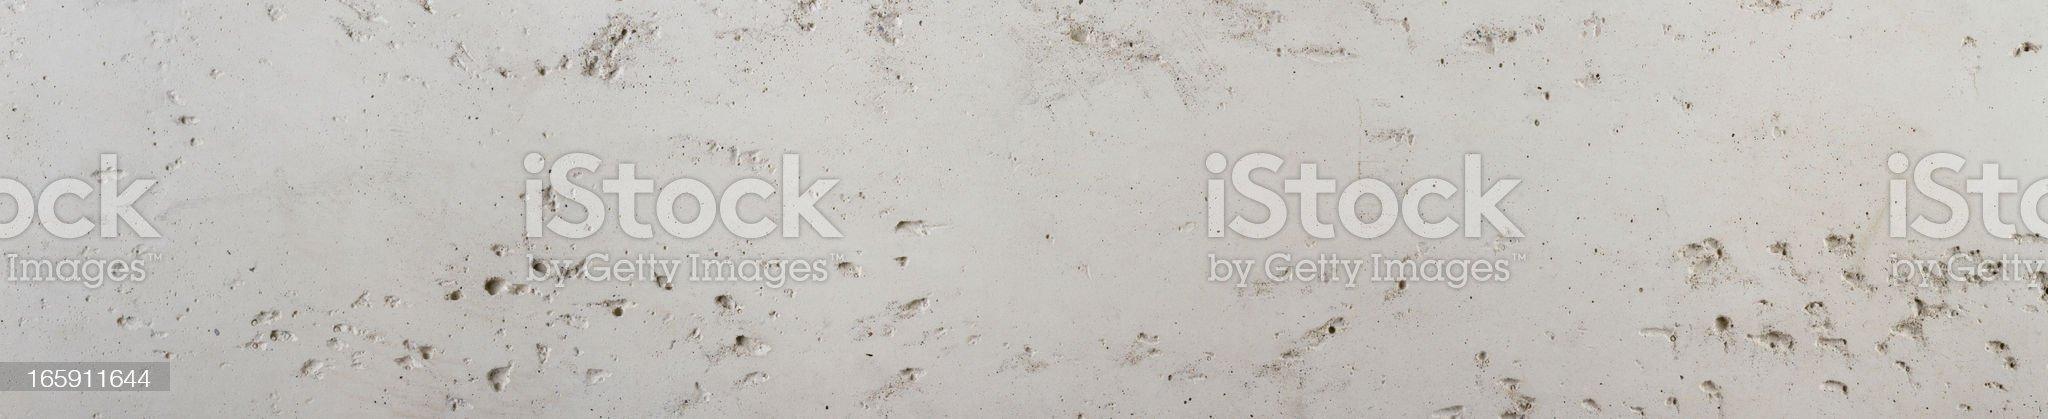 XXXLarge wall texture royalty-free stock photo